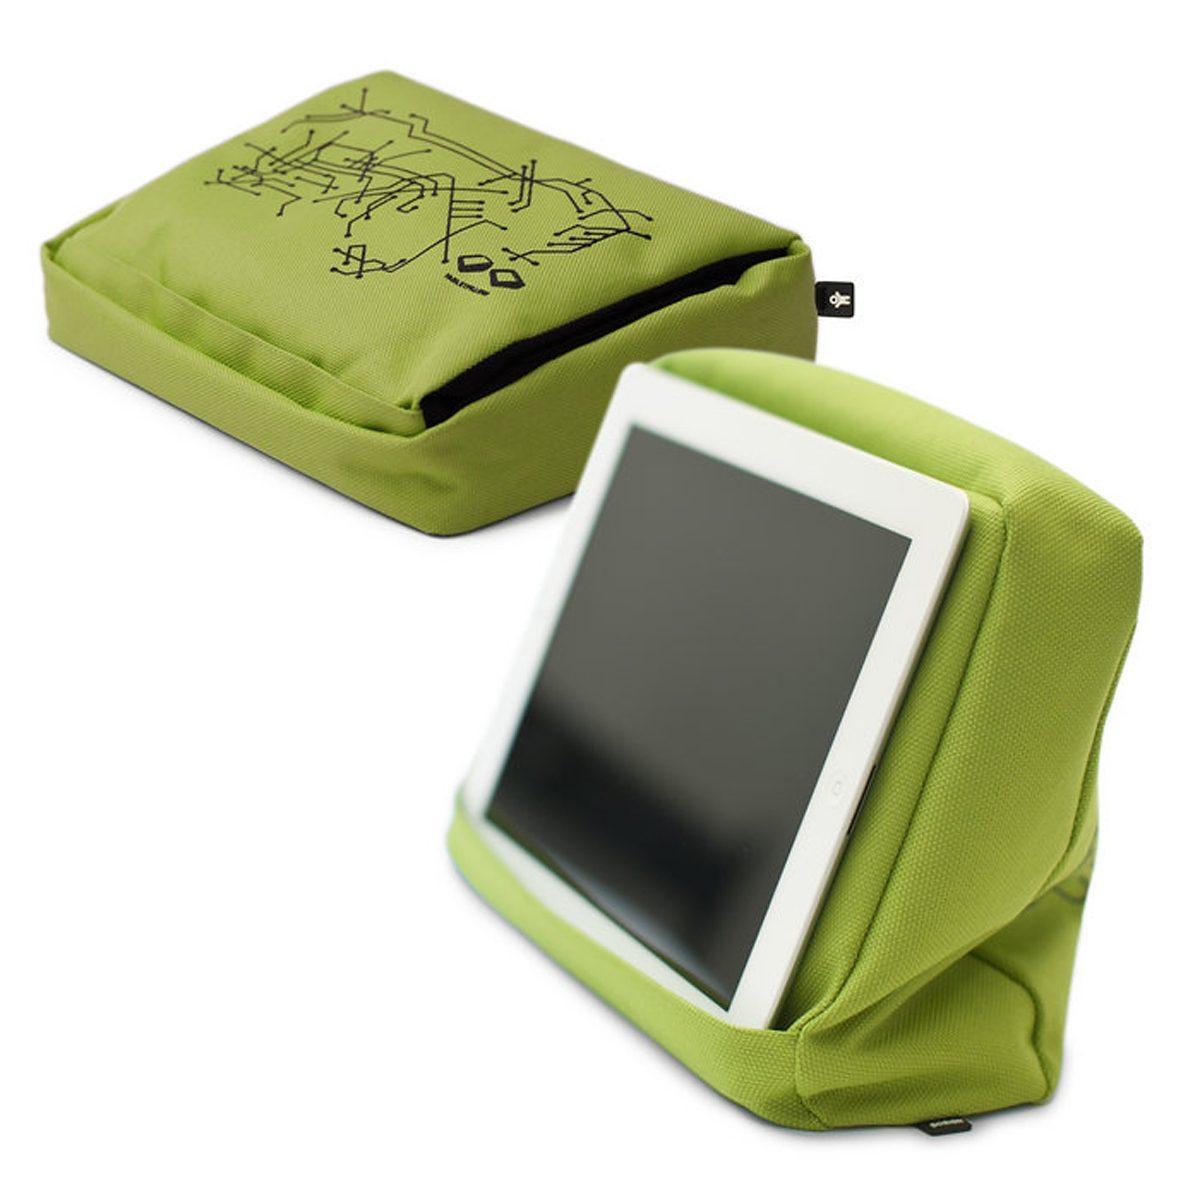 BOSIGN Bosign Tablet-Kissen TABLETPILLOW 2, Limonen grün, schwarz